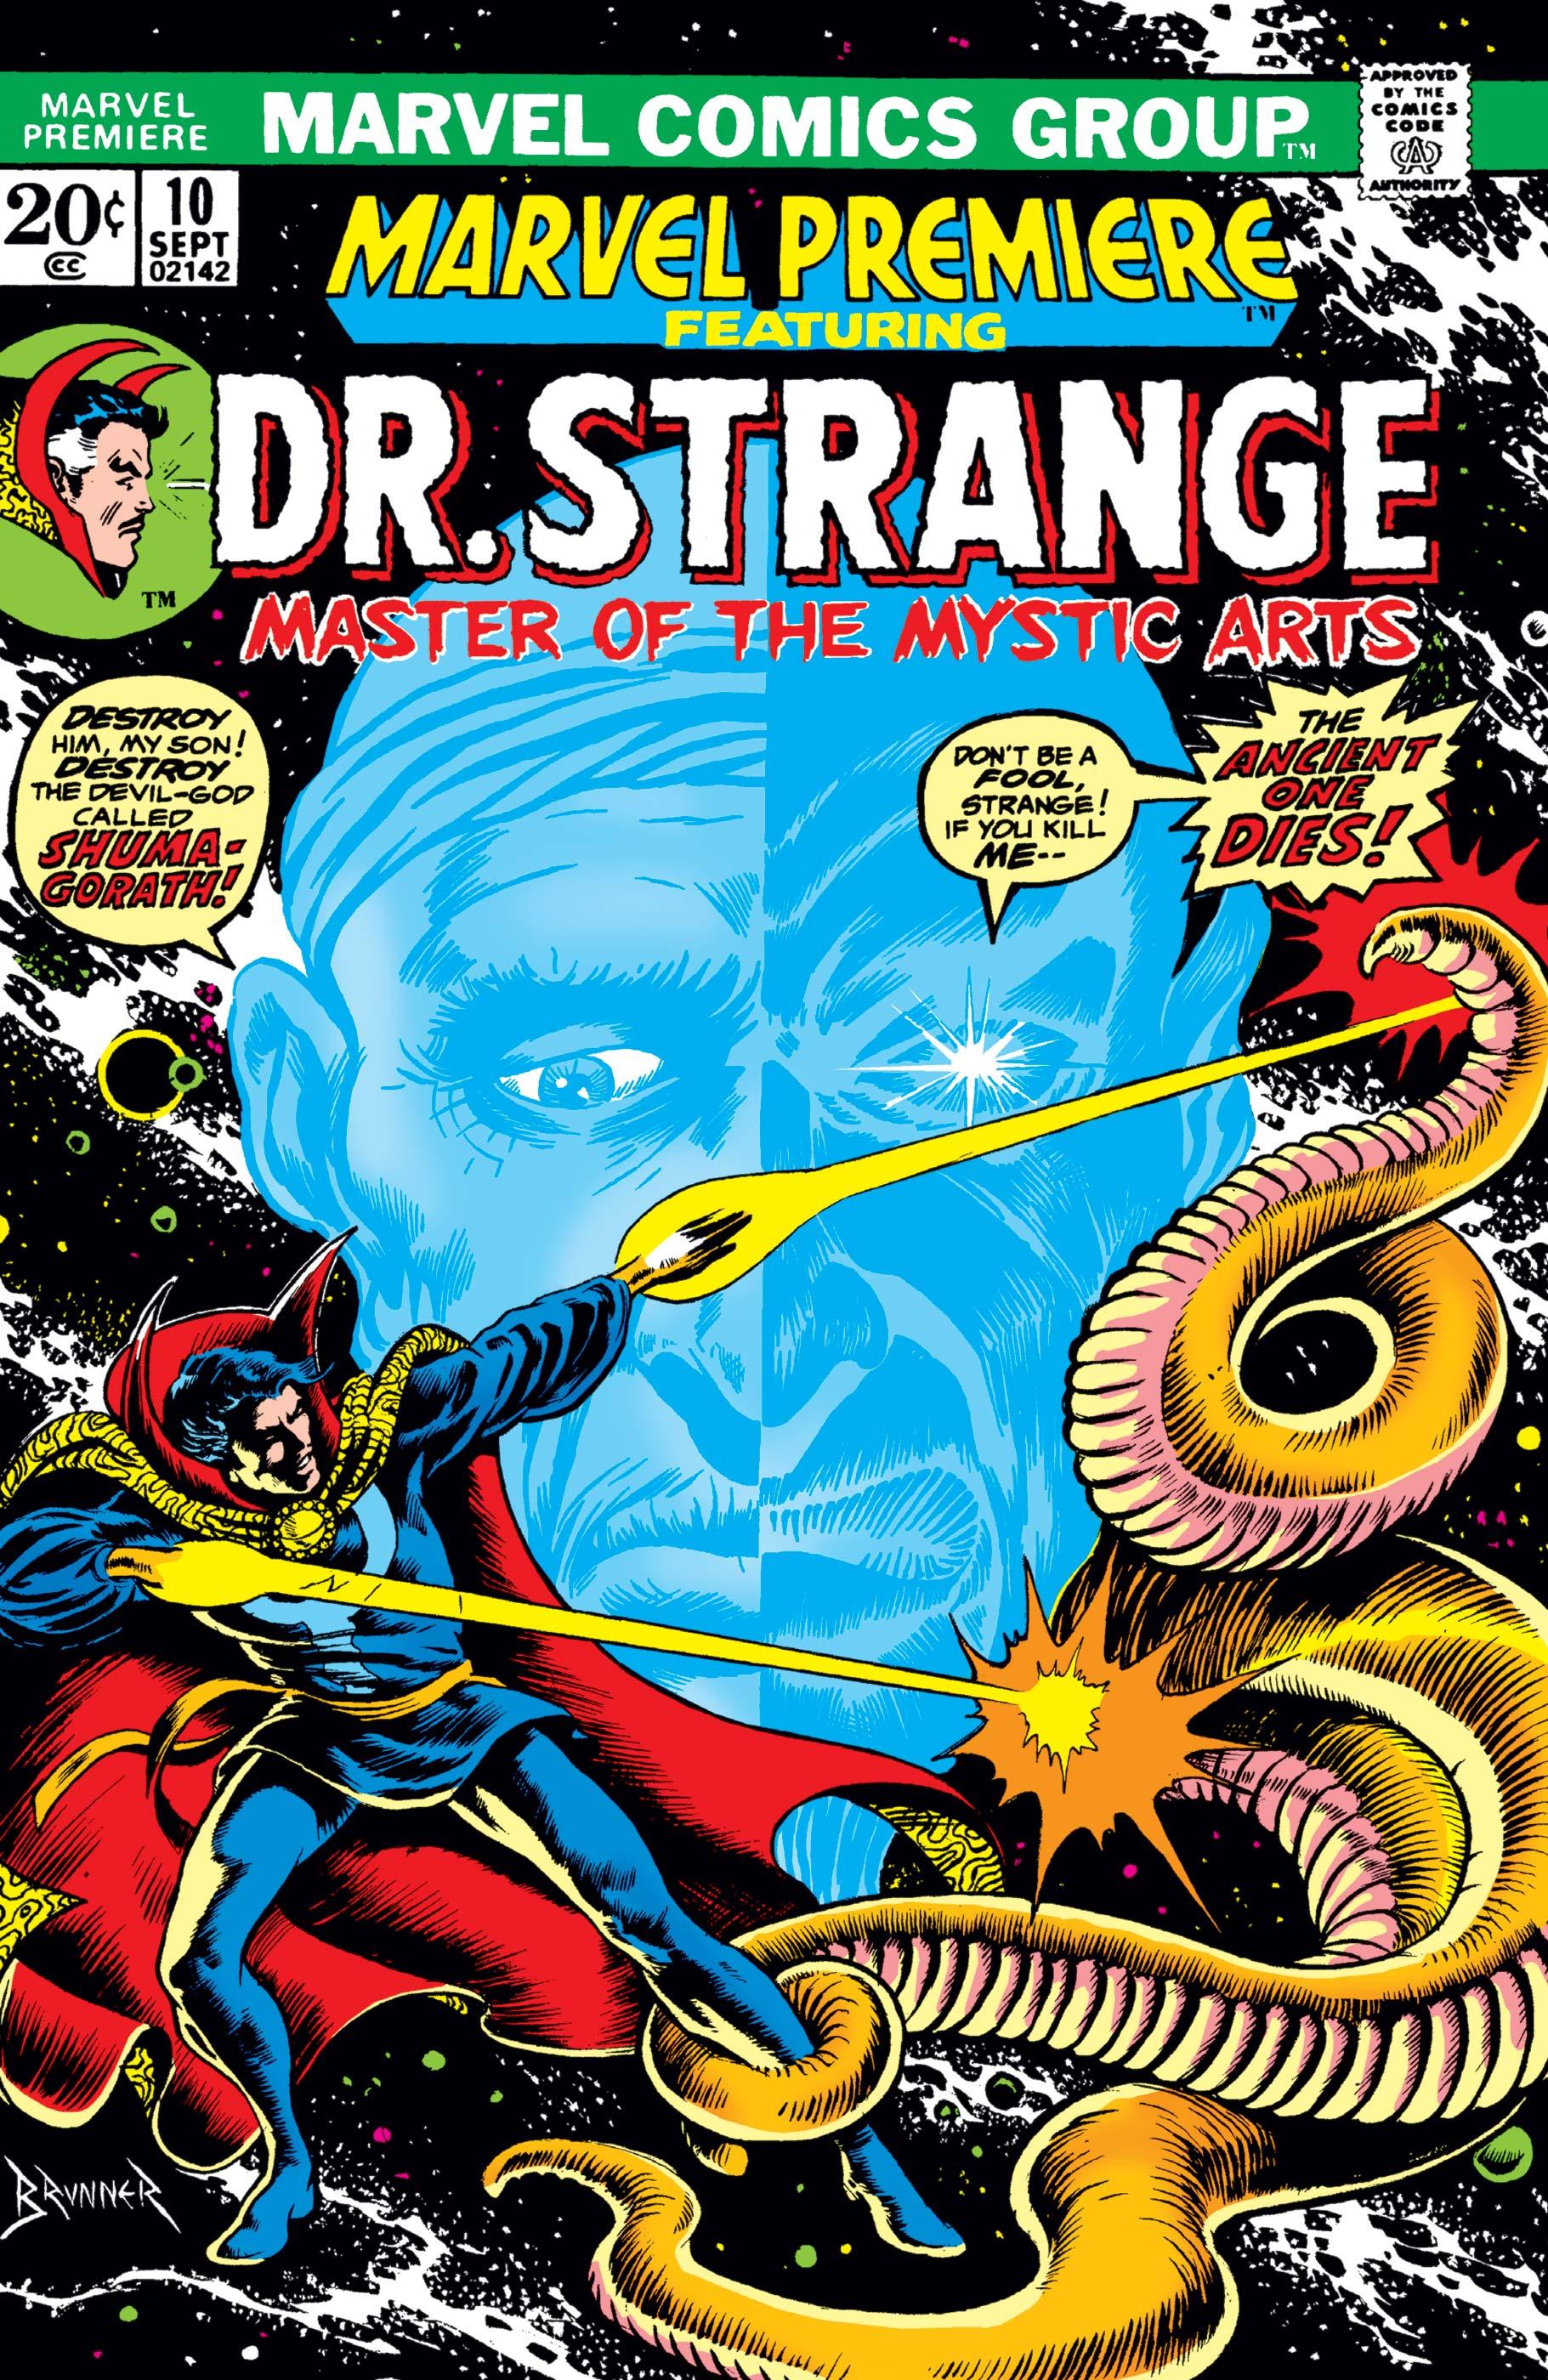 Marvel Premiere (1972) #10